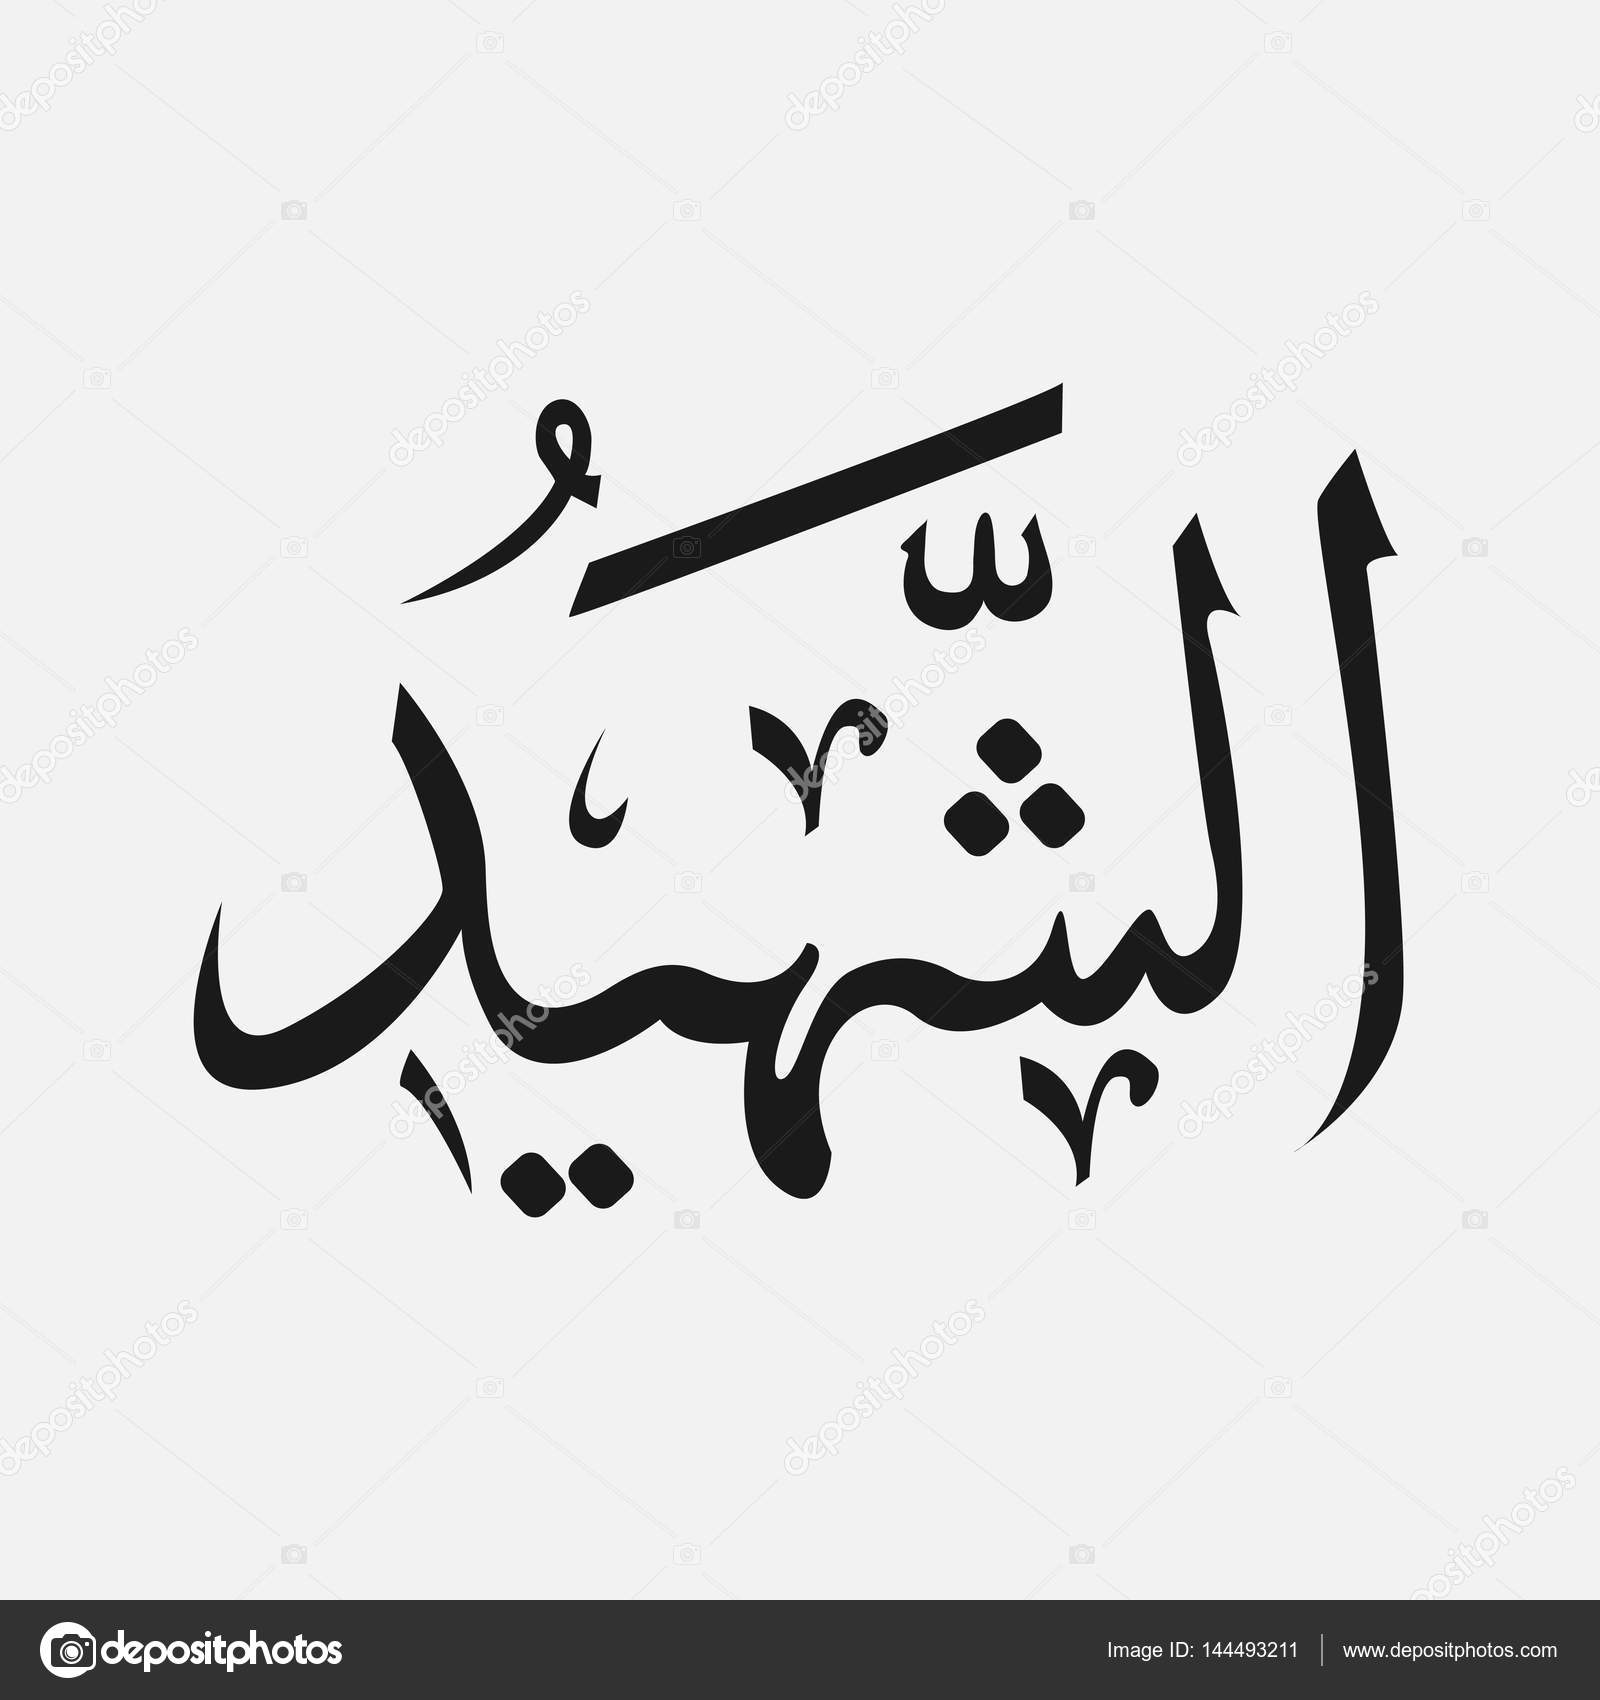 Allah Écrit En Arabe nom de dieu de l'islam, allah en écriture arabe, nom de dieu en